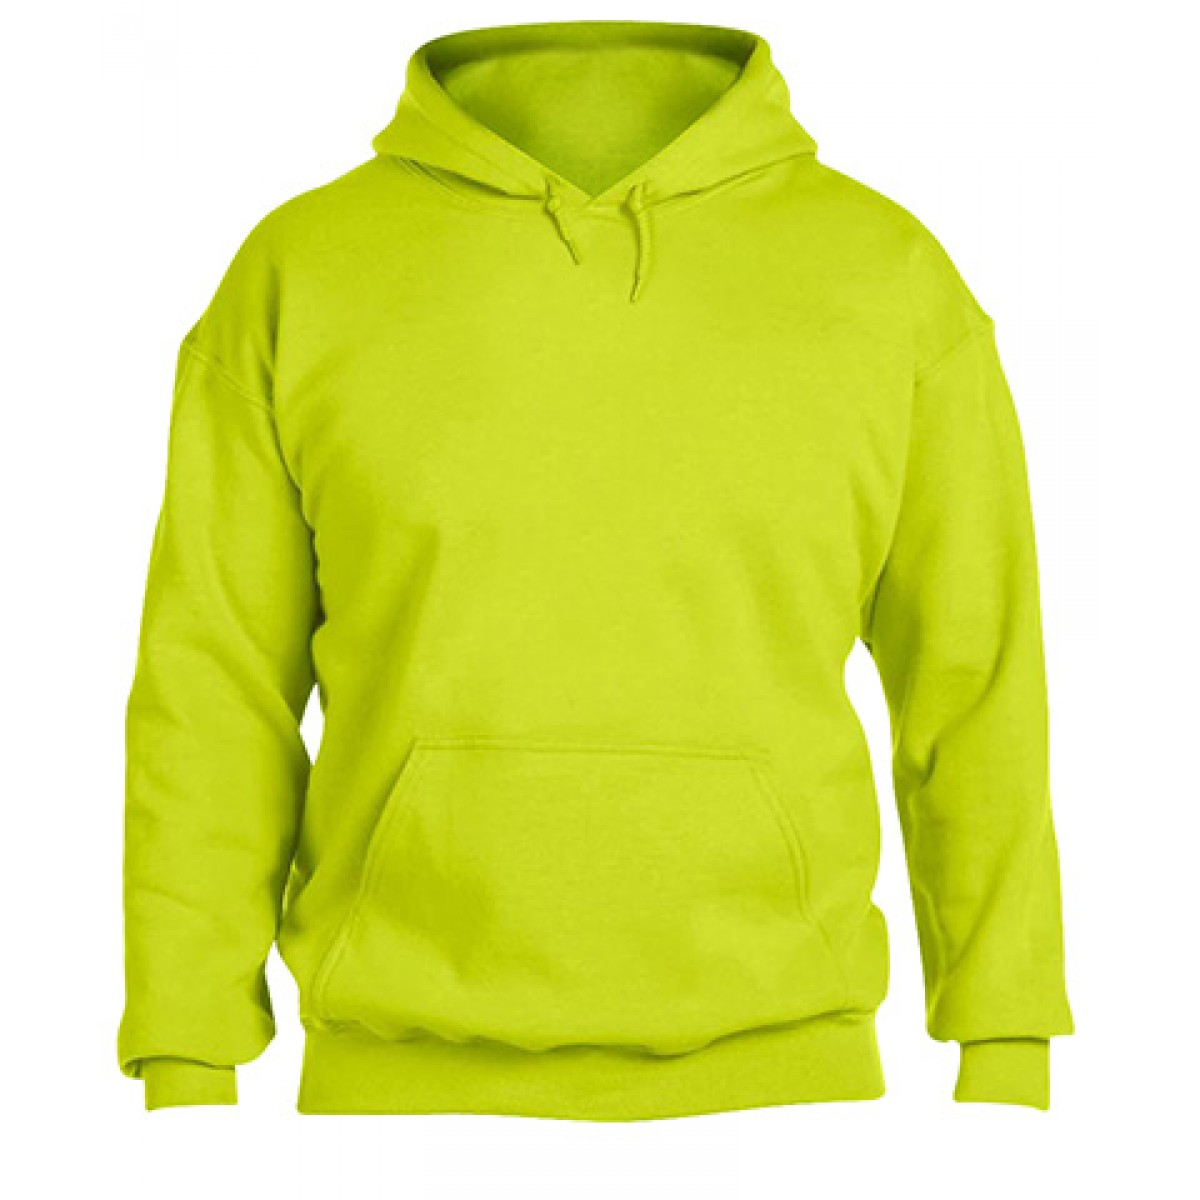 Hooded Sweatshirt 50/50 Heavy Blend-Safety Green-XL